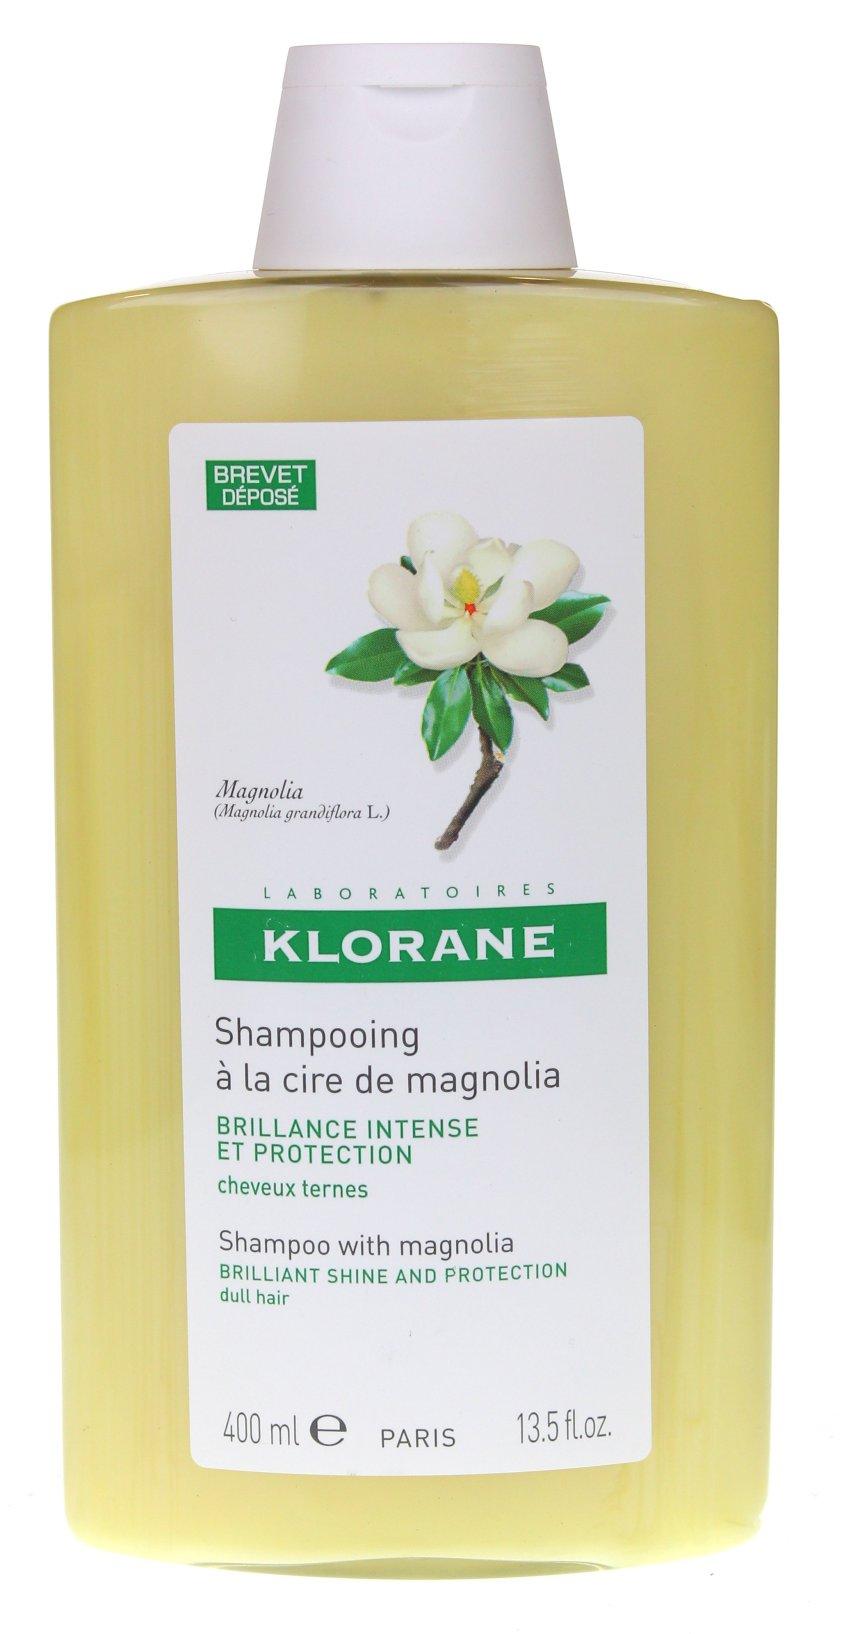 Klorane Shampoo Magnolia Σαμπουάν με Μανόλια για Λάμψη 200ml